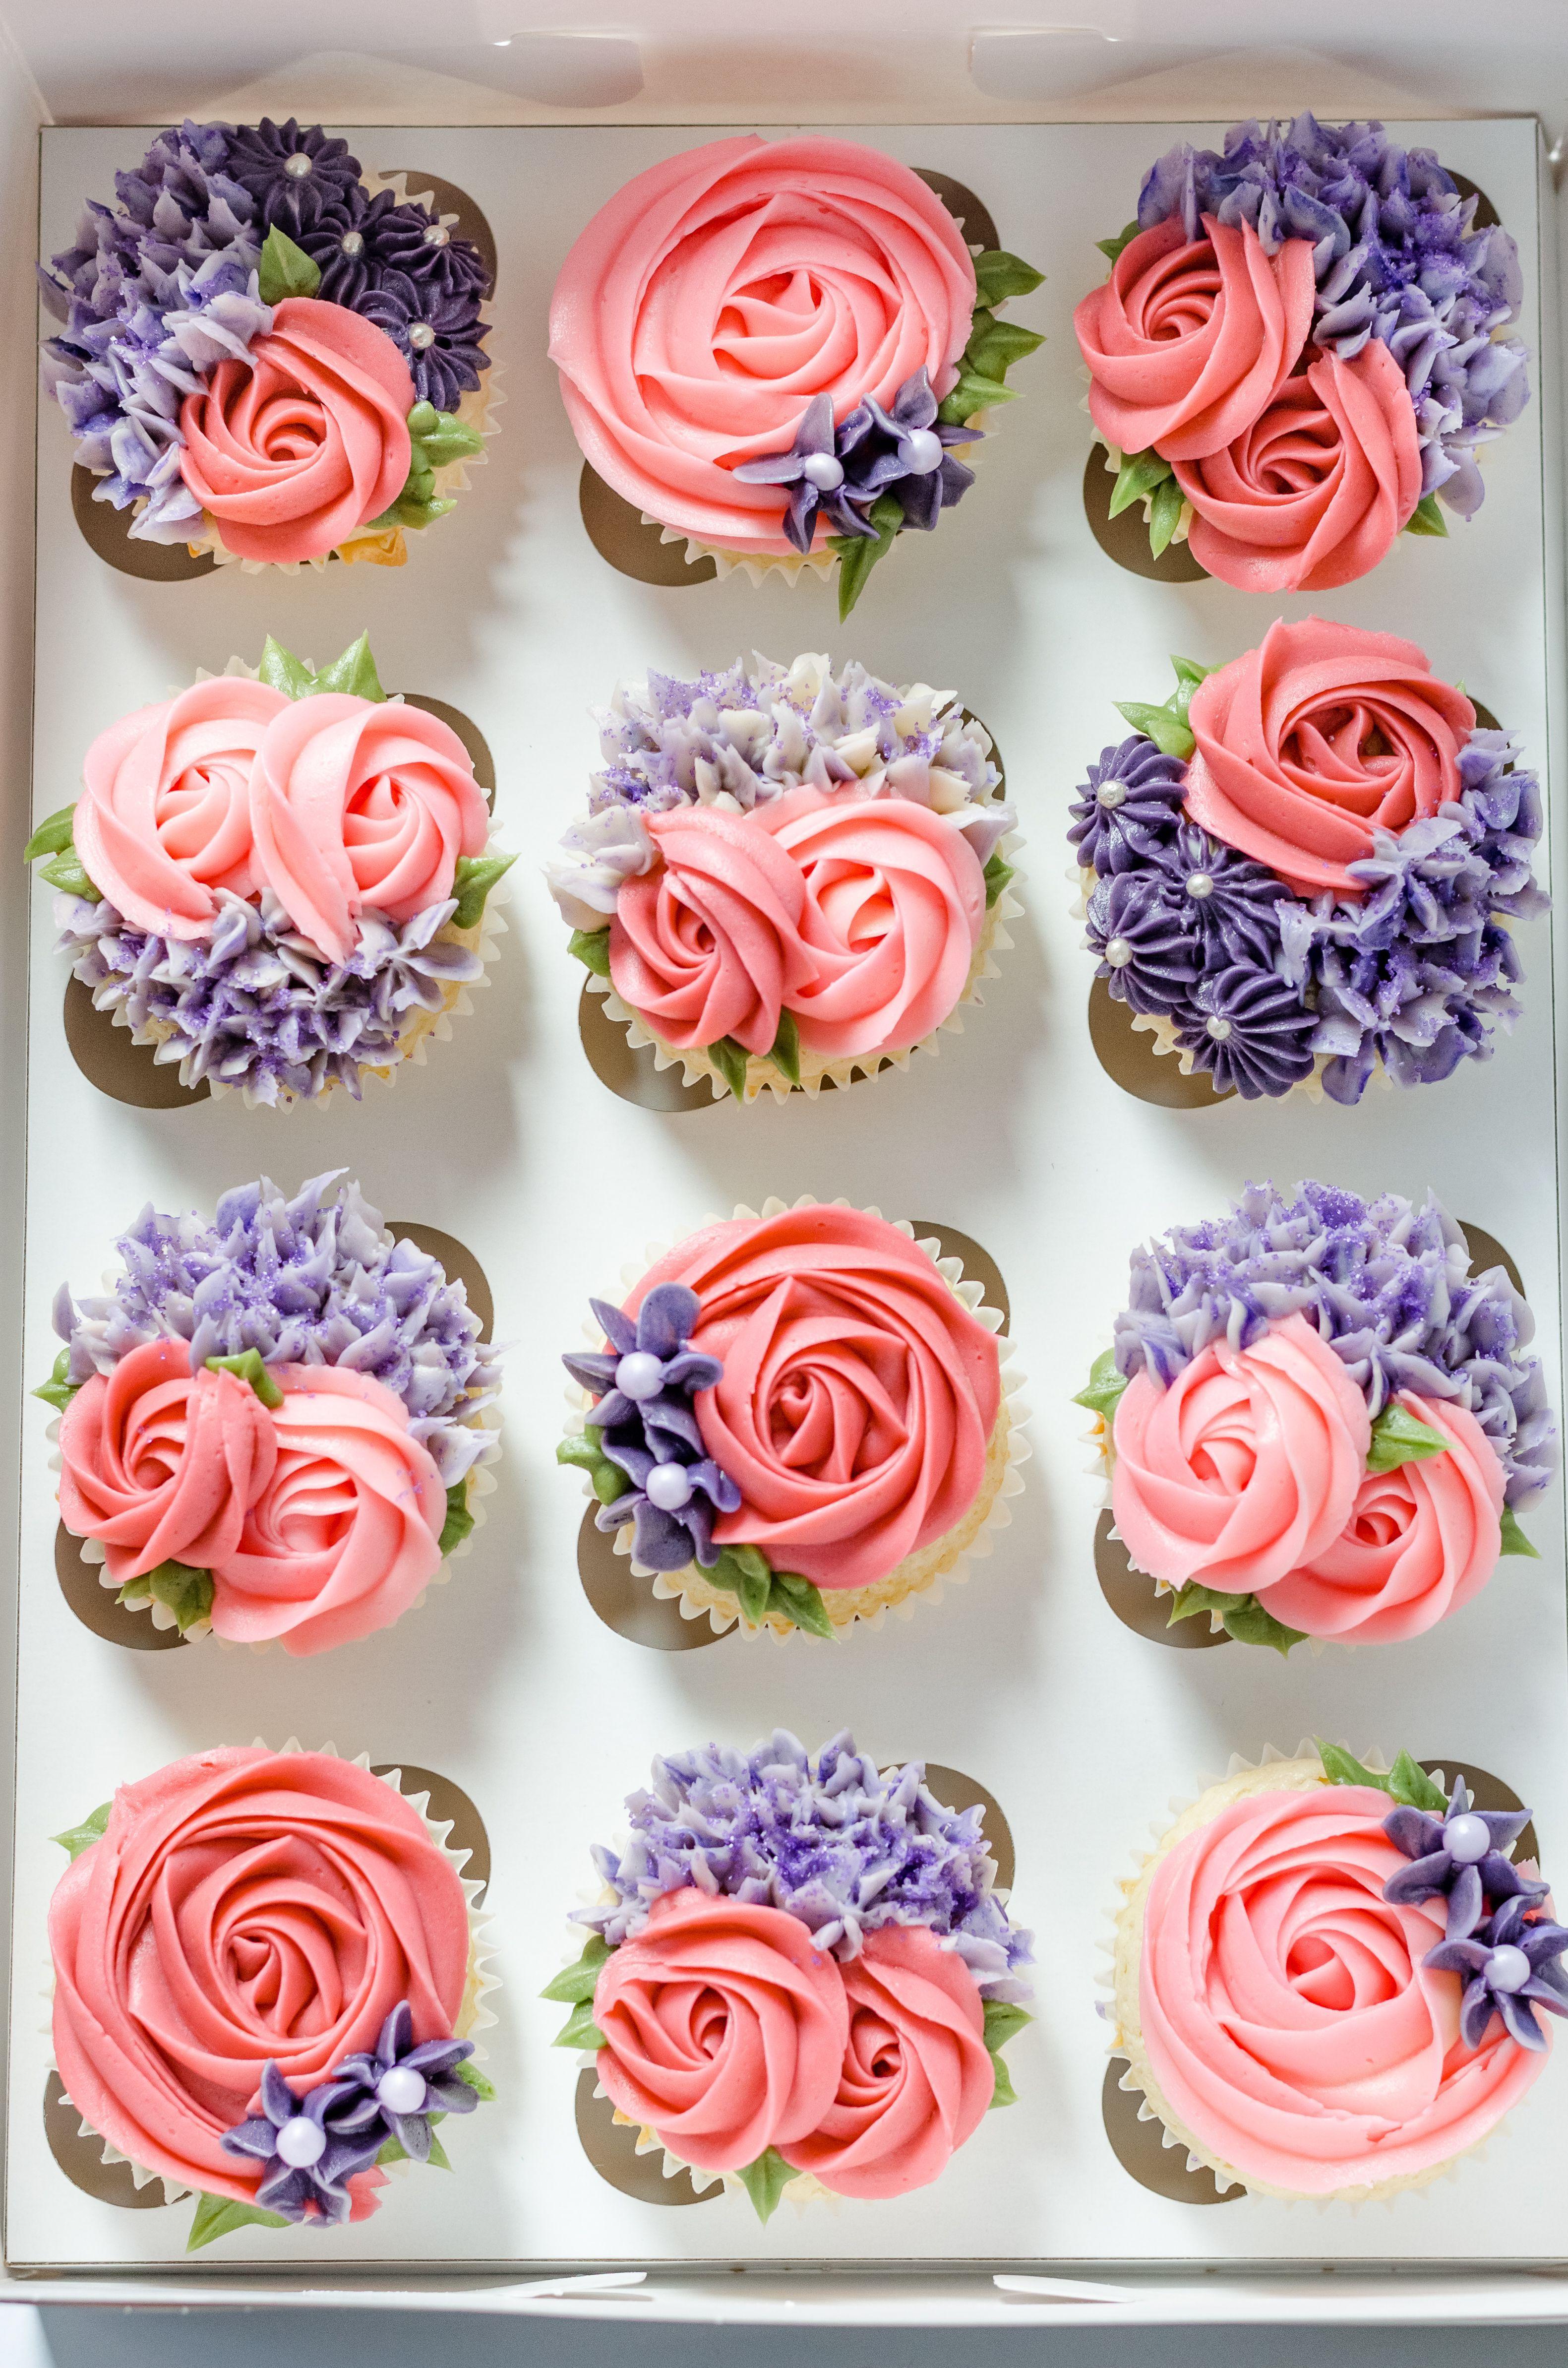 Flower cupcakes Decorating ideas | Fun cupcakes, Dessert ...